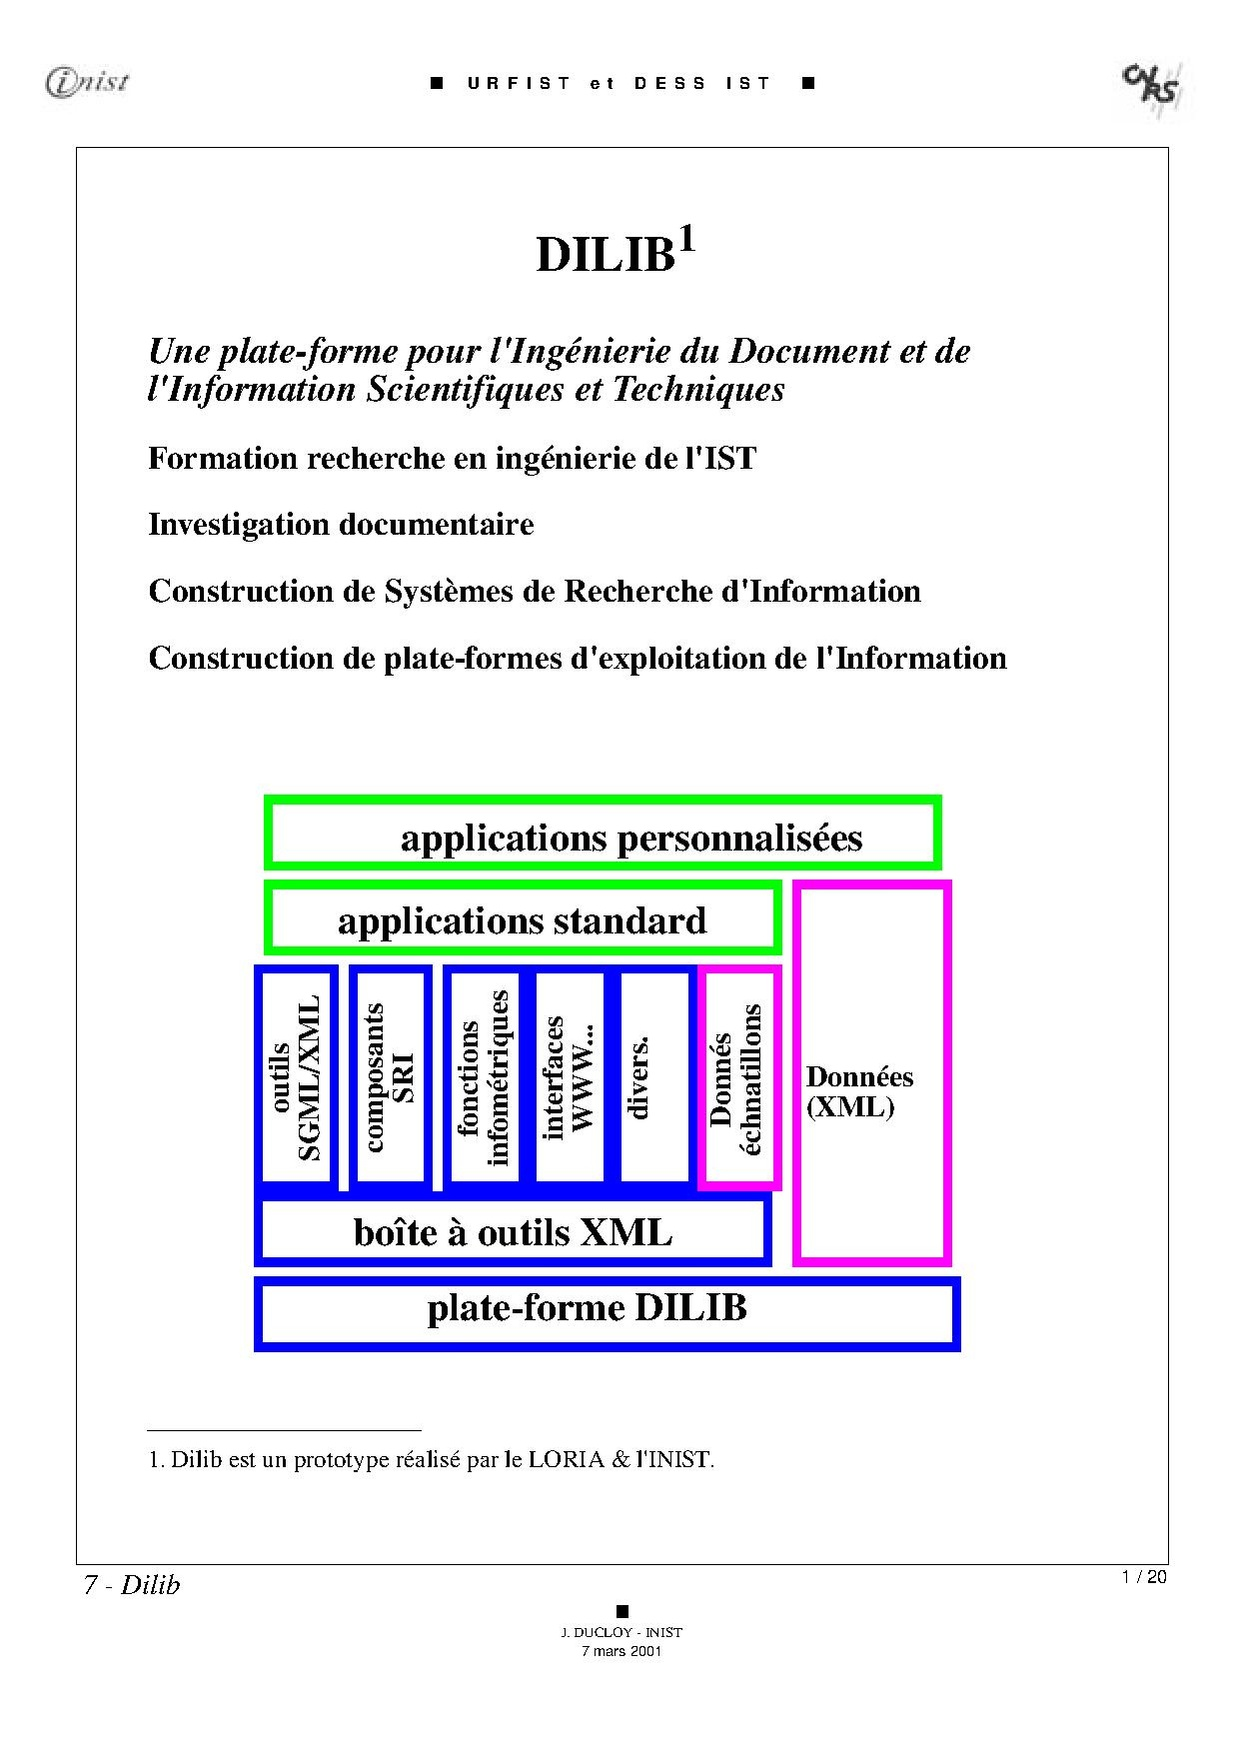 Dilib présentation 2001 urfist.pdf